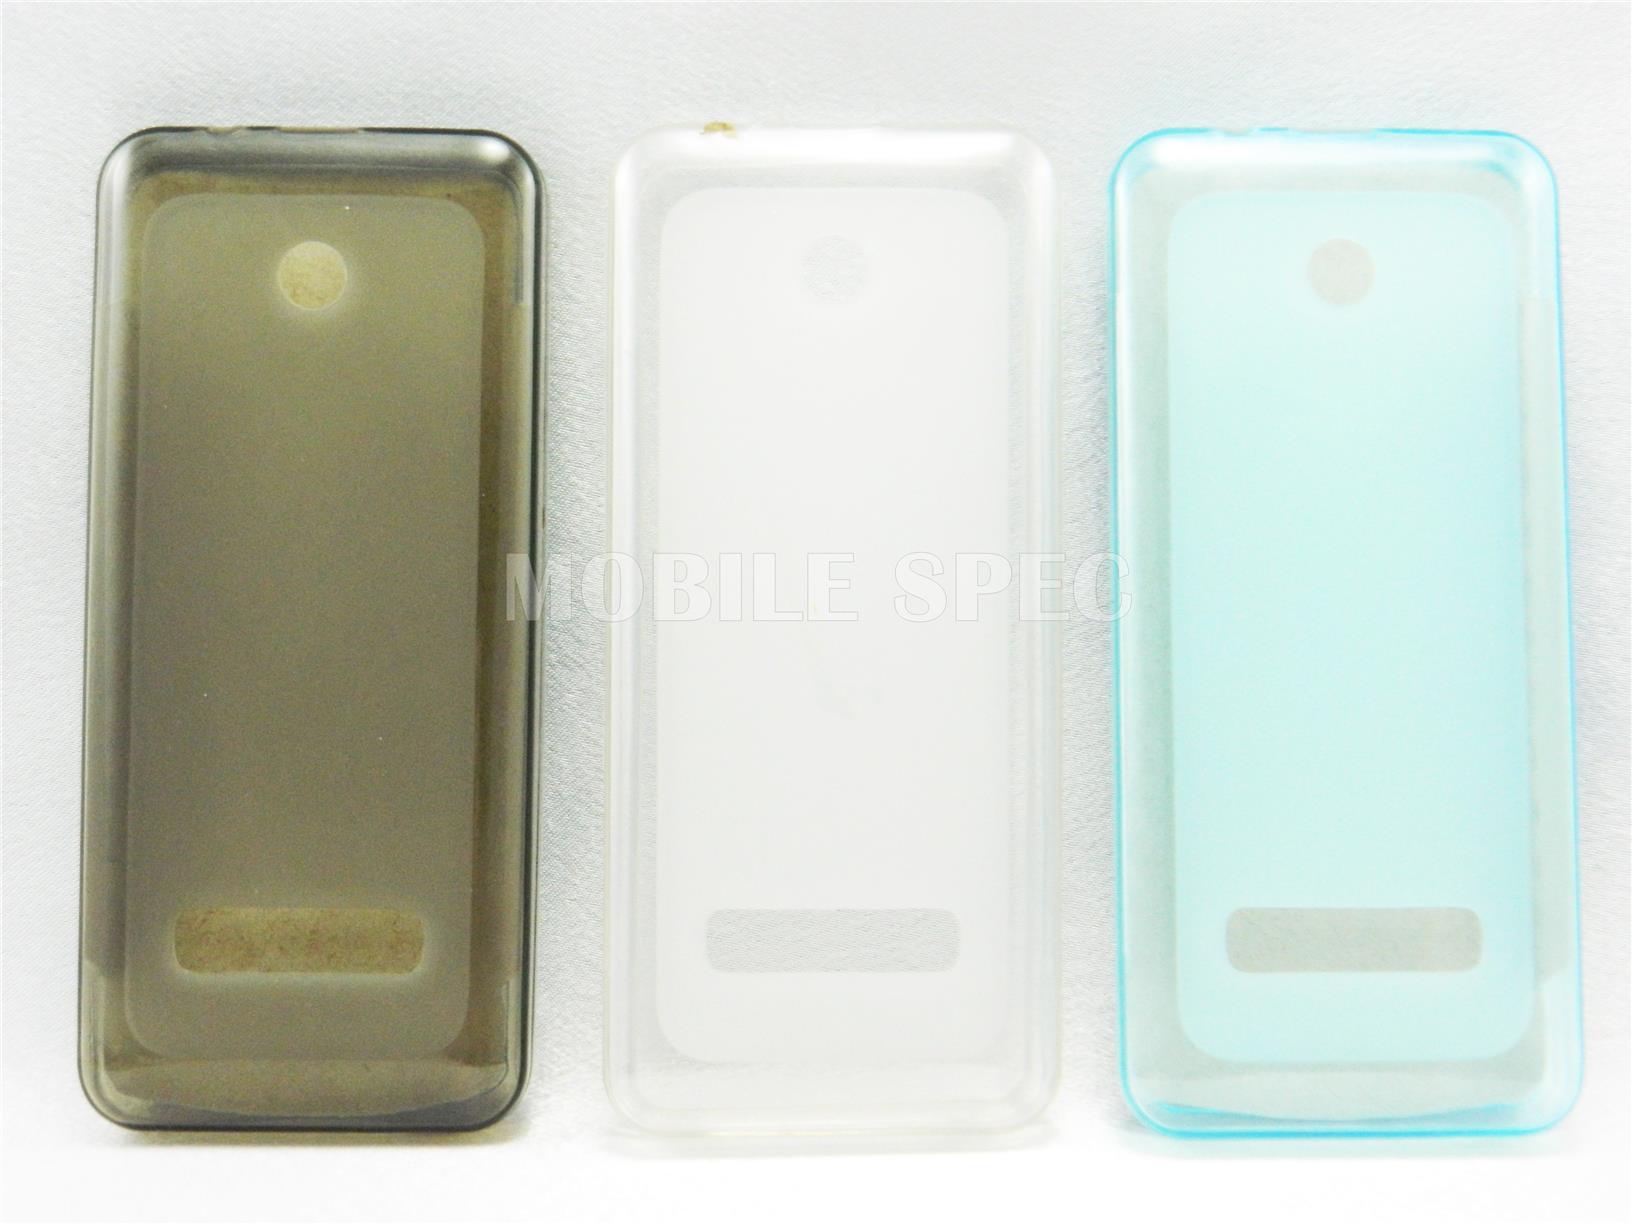 new product 2d105 afaac Nokia 301 Pudding Transparent TPU Soft Tinted Case Casing